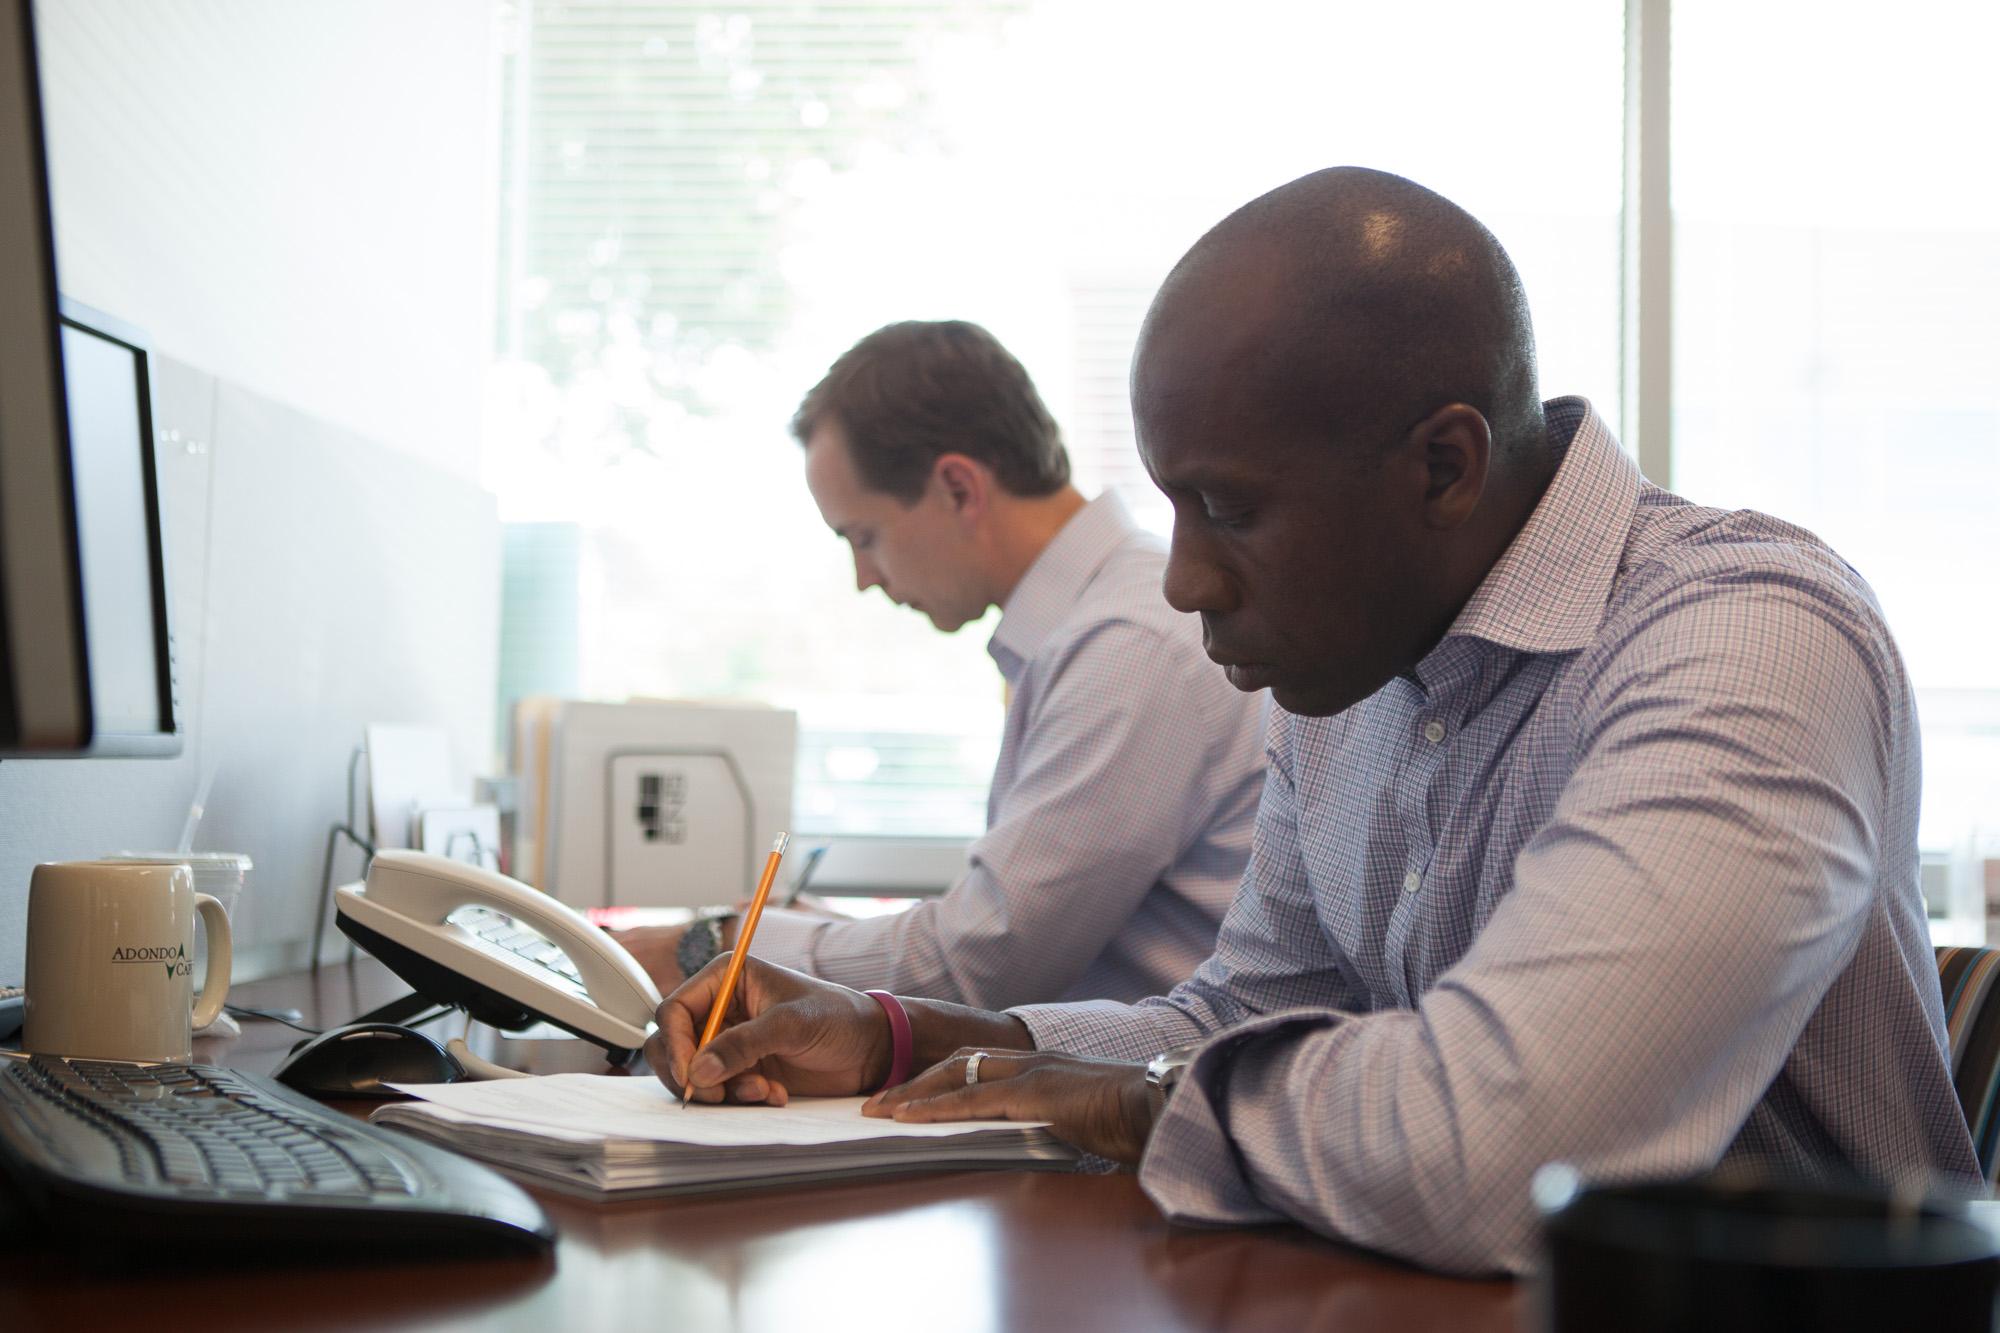 Men Working in the Office